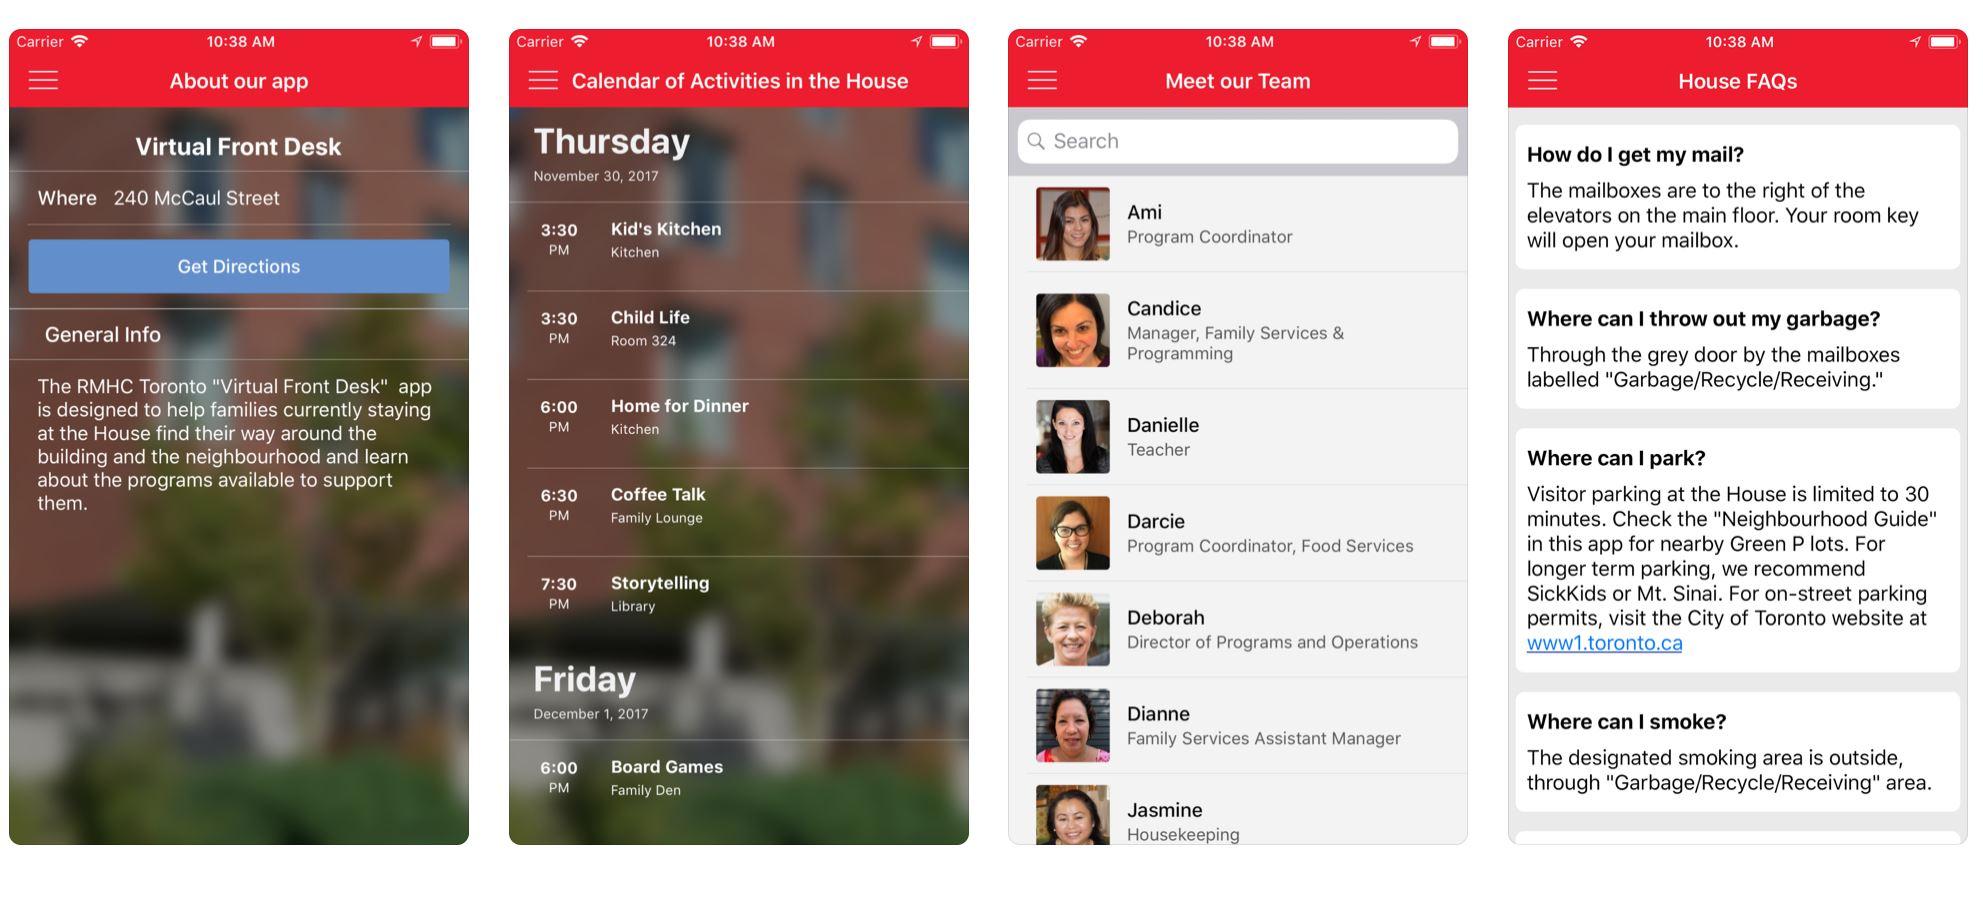 RMHC Toronto - Virtual Front Desk - iOS app